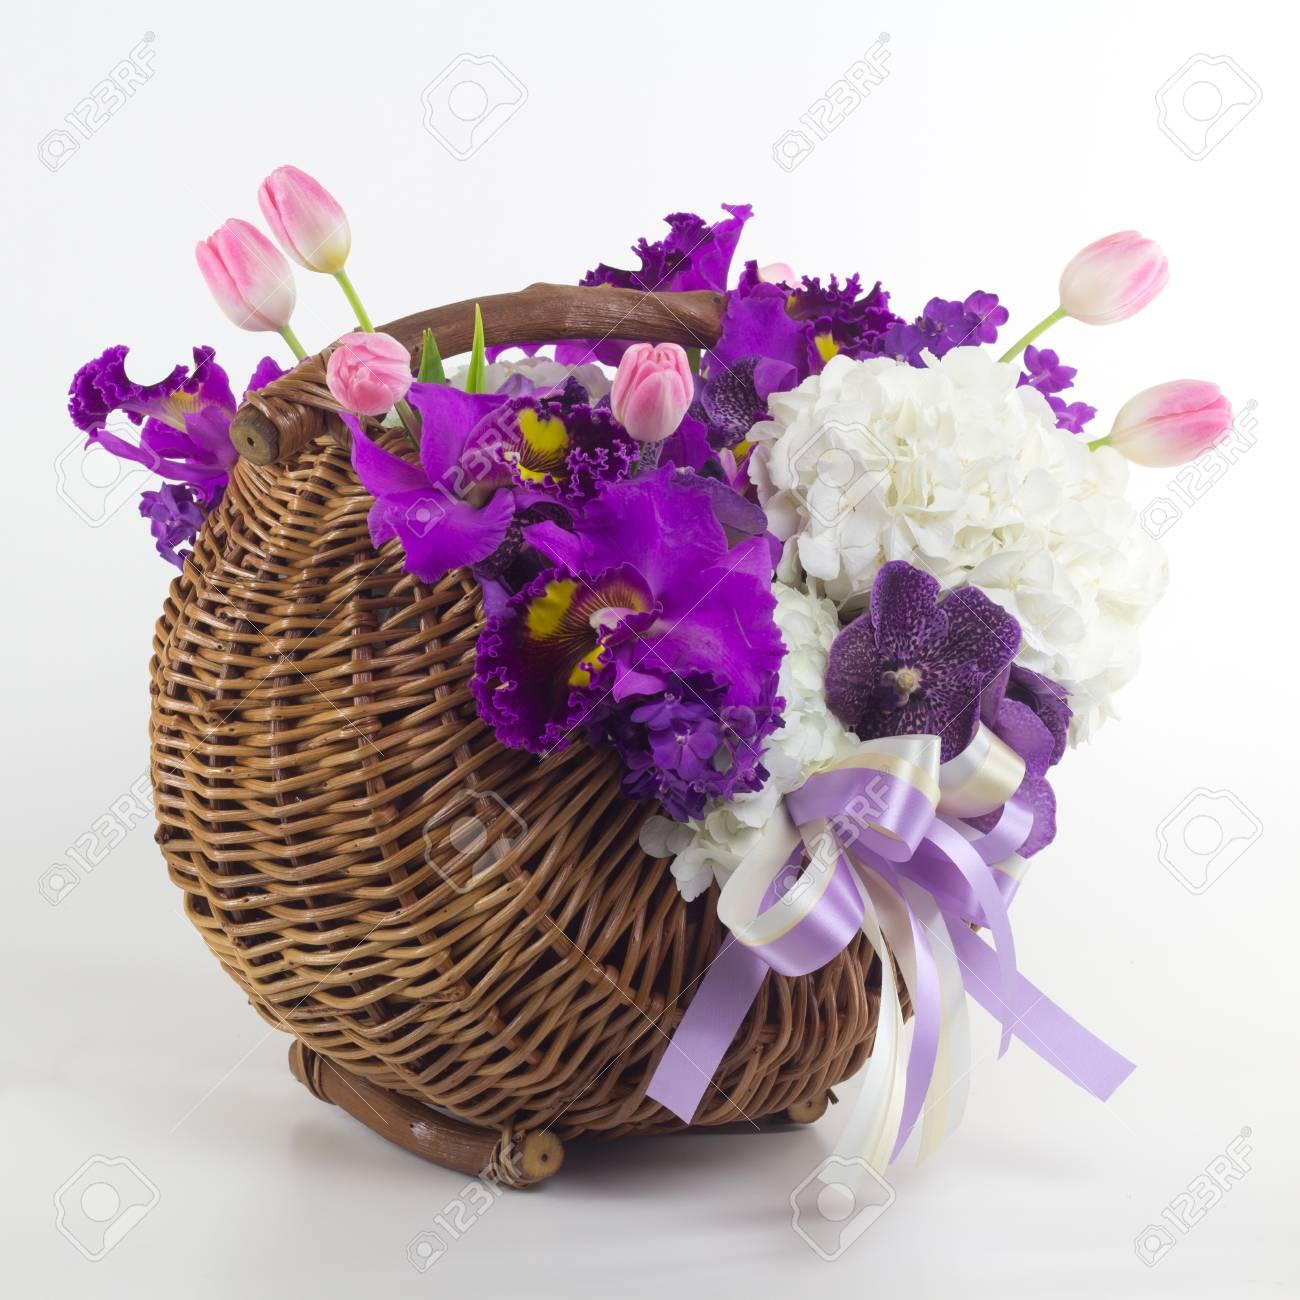 Beautiful flowers in basket isolated stock photo picture and beautiful flowers in basket isolated stock photo 44912466 izmirmasajfo